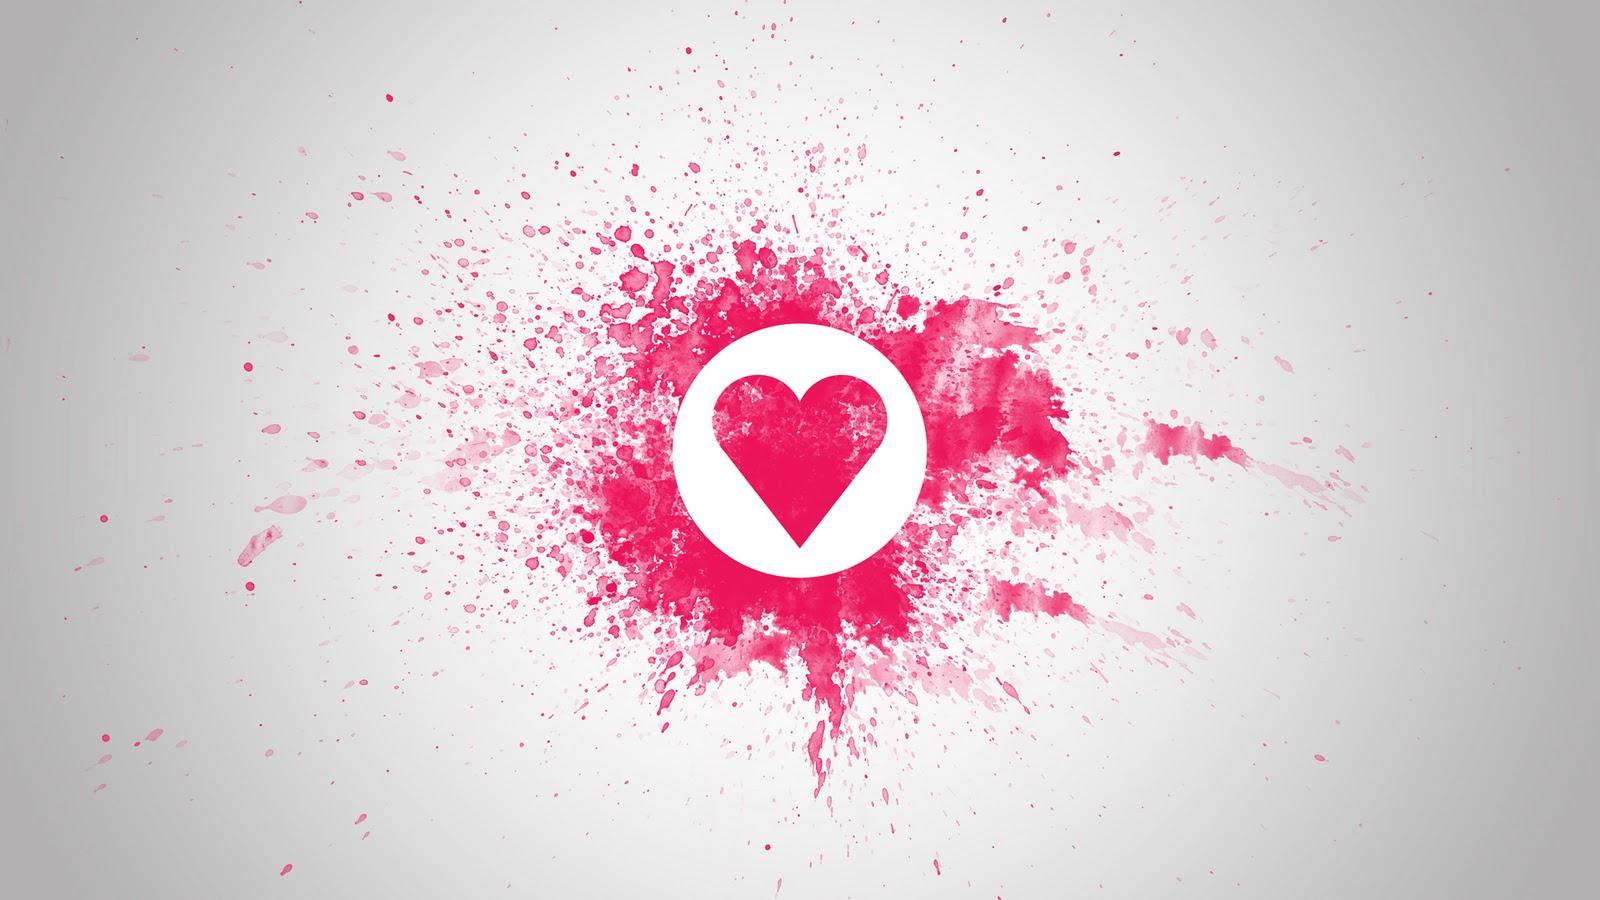 love heart pink 1600x900 hd wallpaper love wallpapers